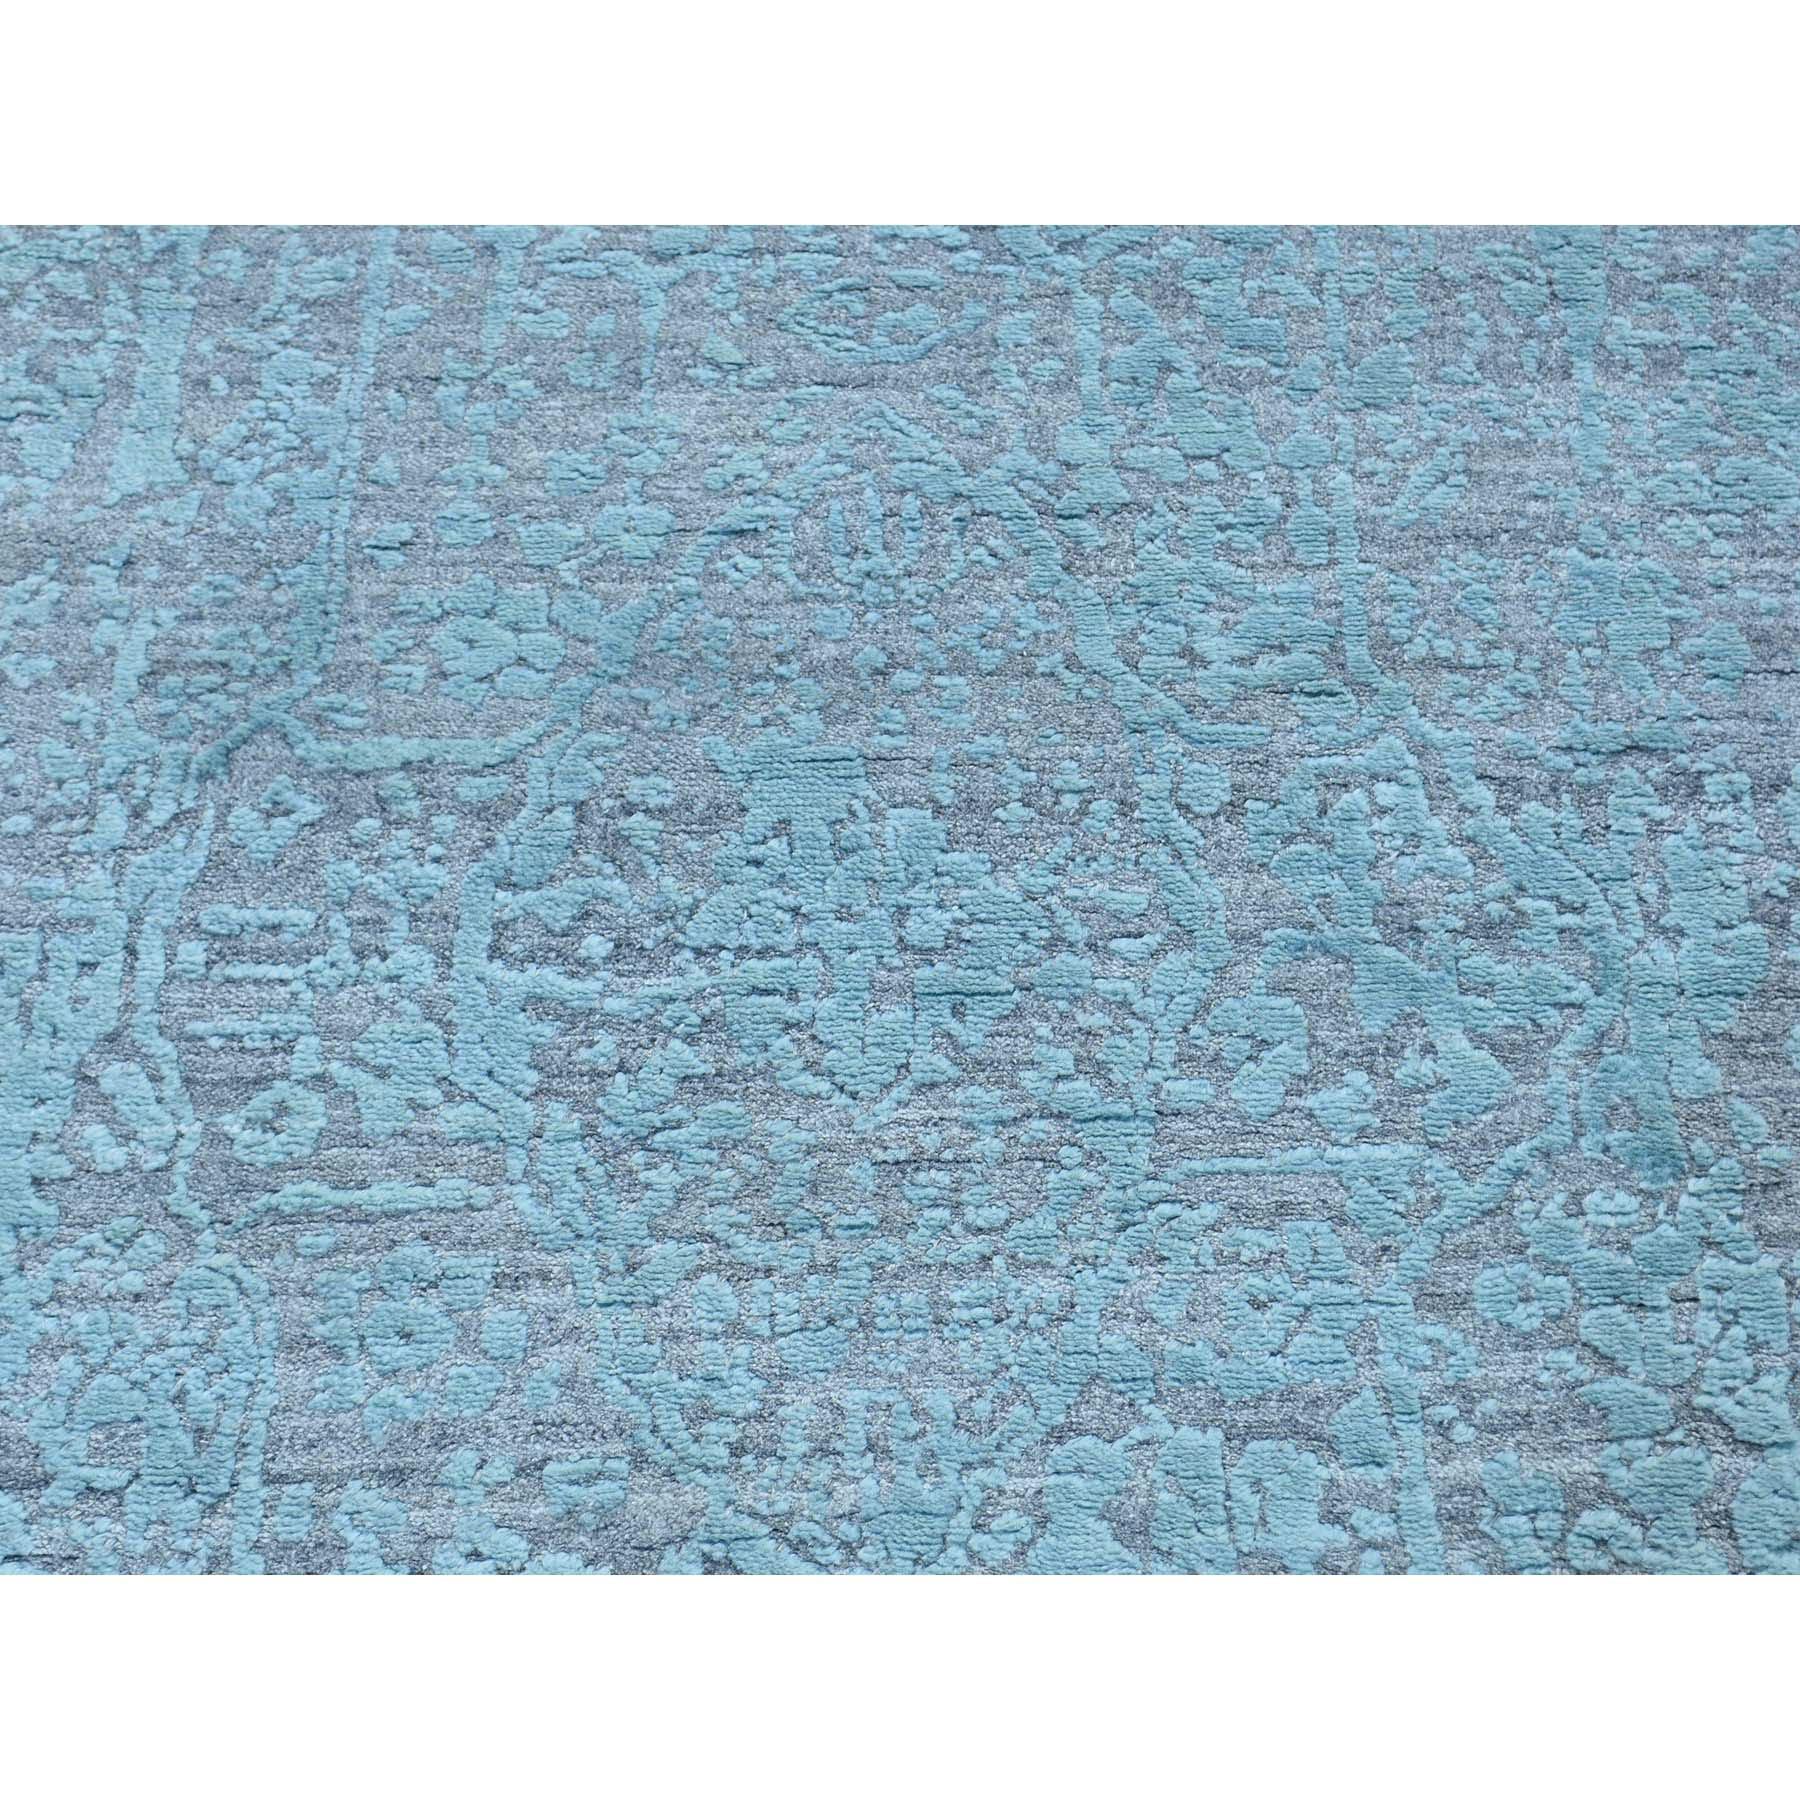 2'6''x10' Broken Persian Design Hand-Knotted Wool and Silk Runner Rug